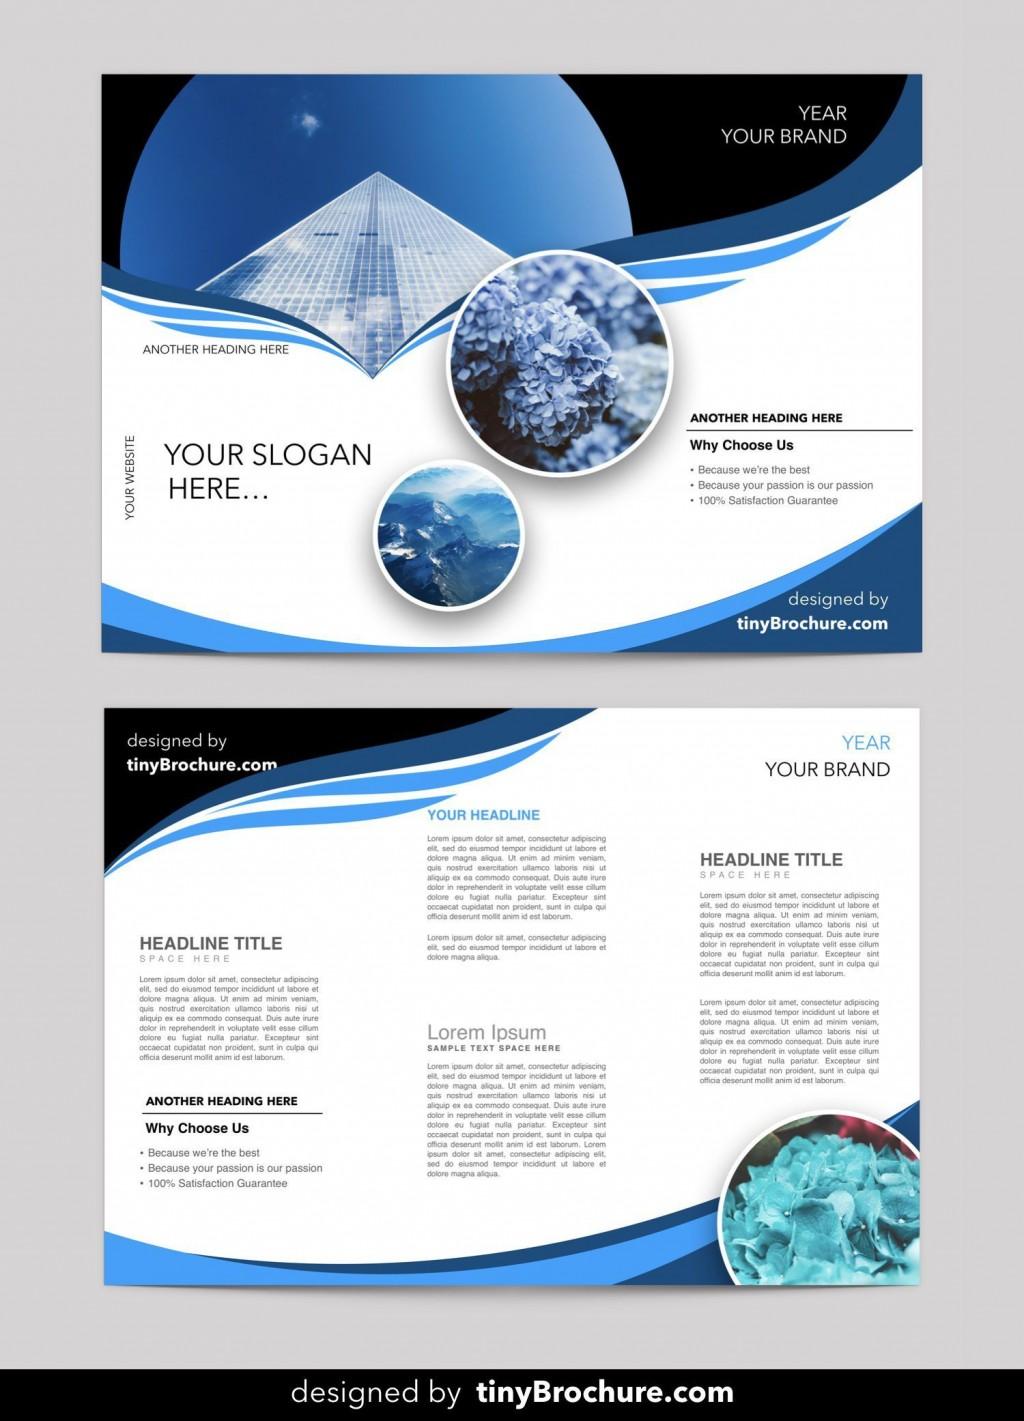 004 Unforgettable Brochure Template For Word 2010 Image  Download Microsoft Free Blank Tri FoldLarge